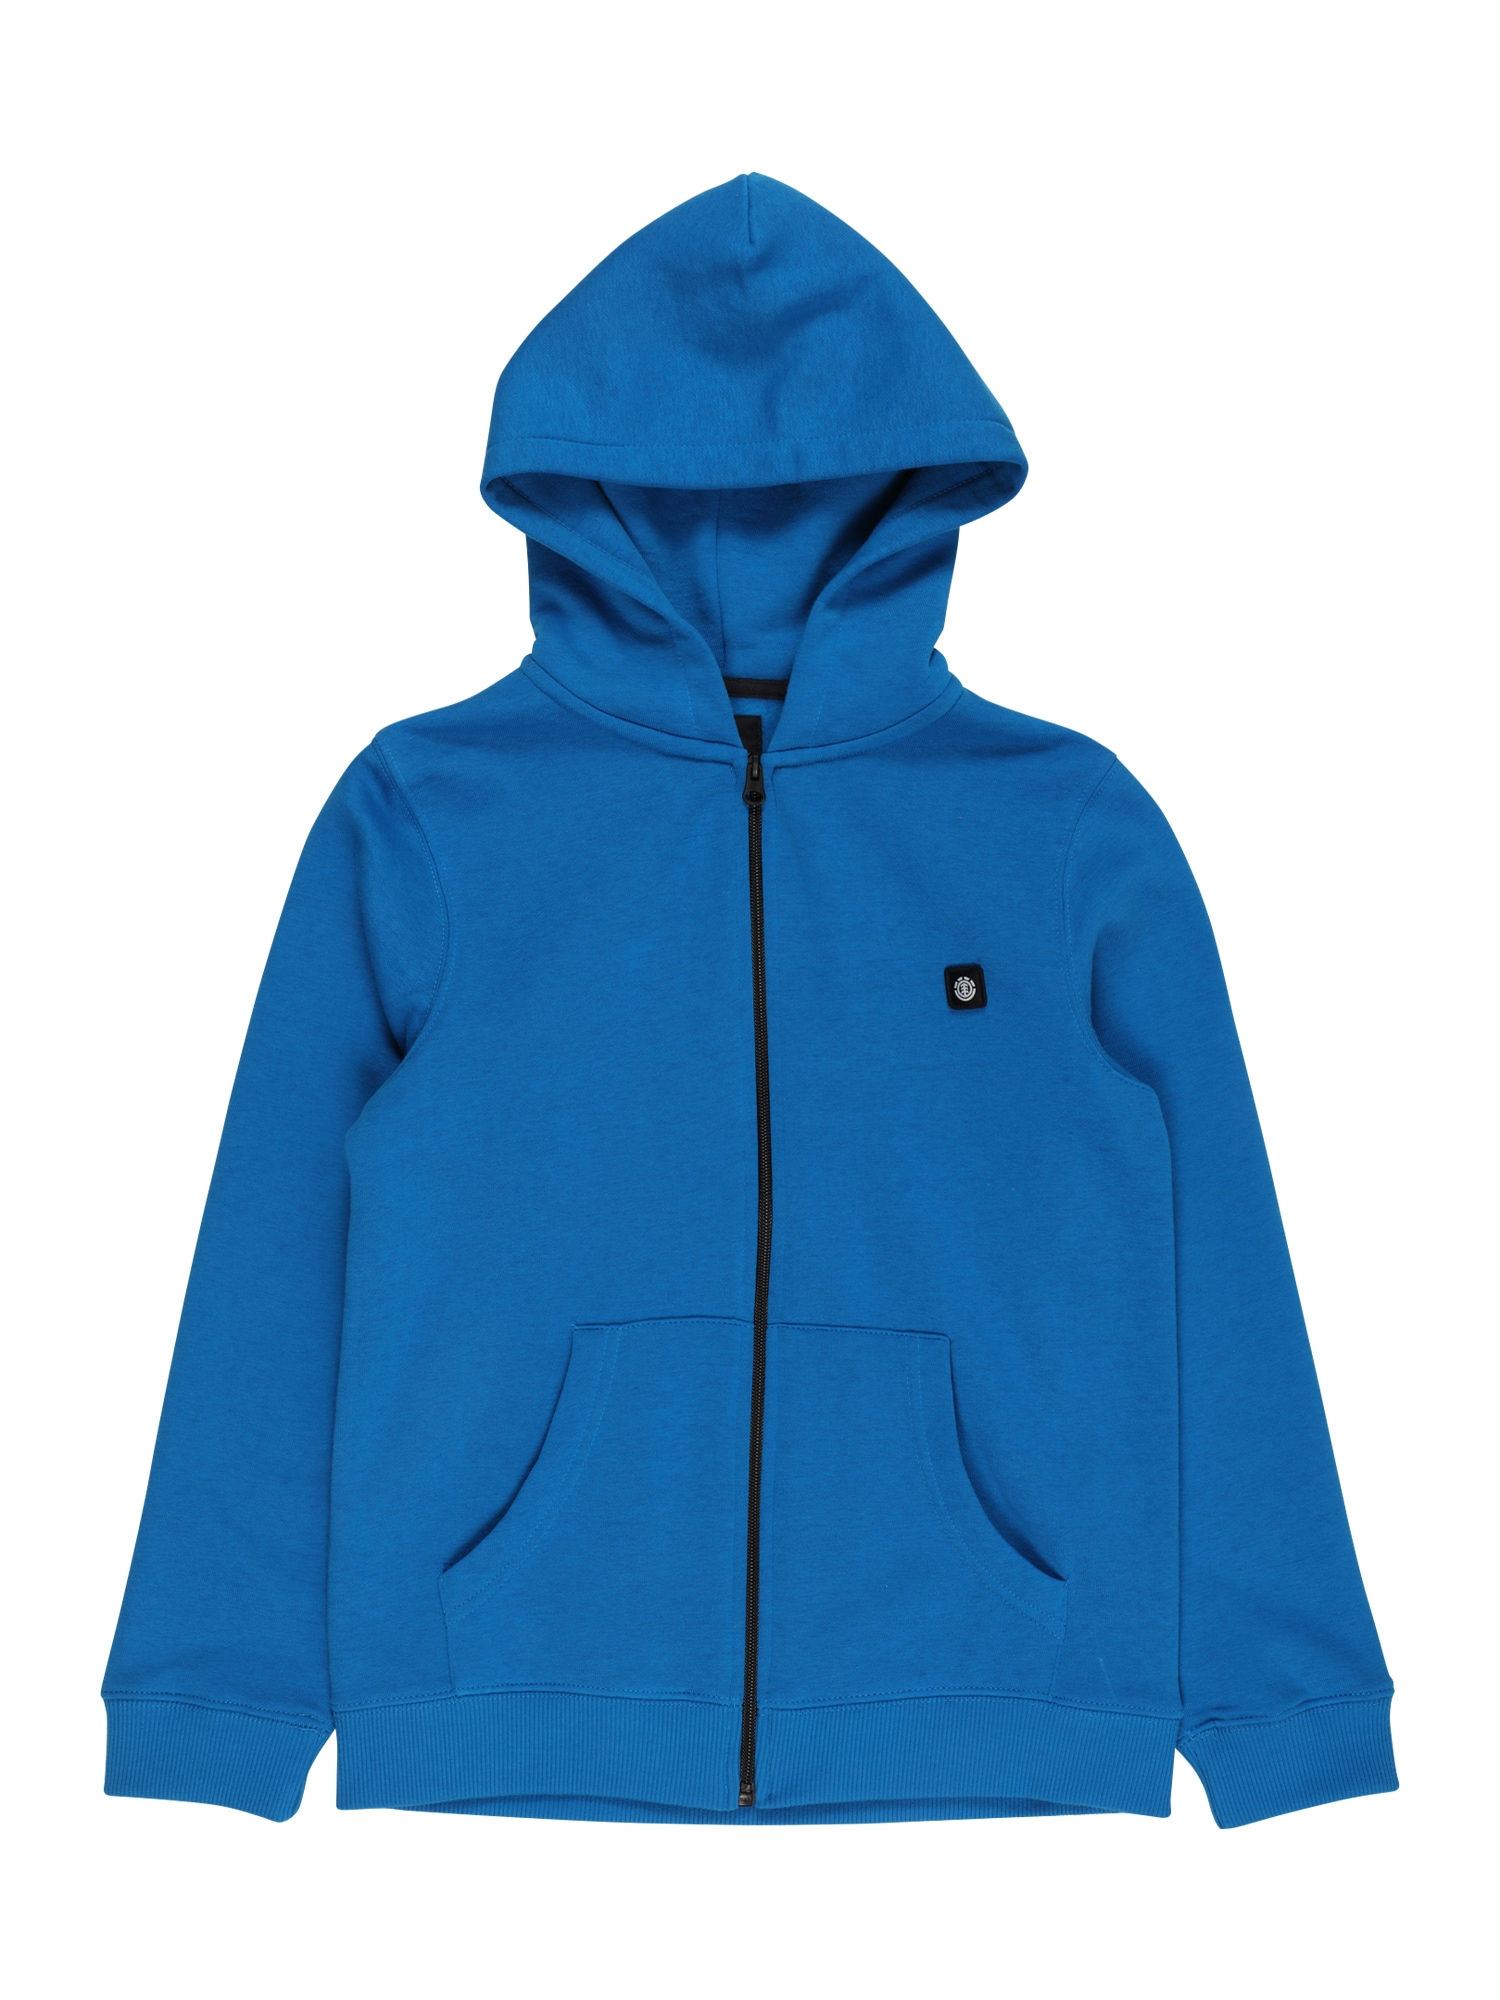 ELEMENT Sportinis džemperis mėlyna